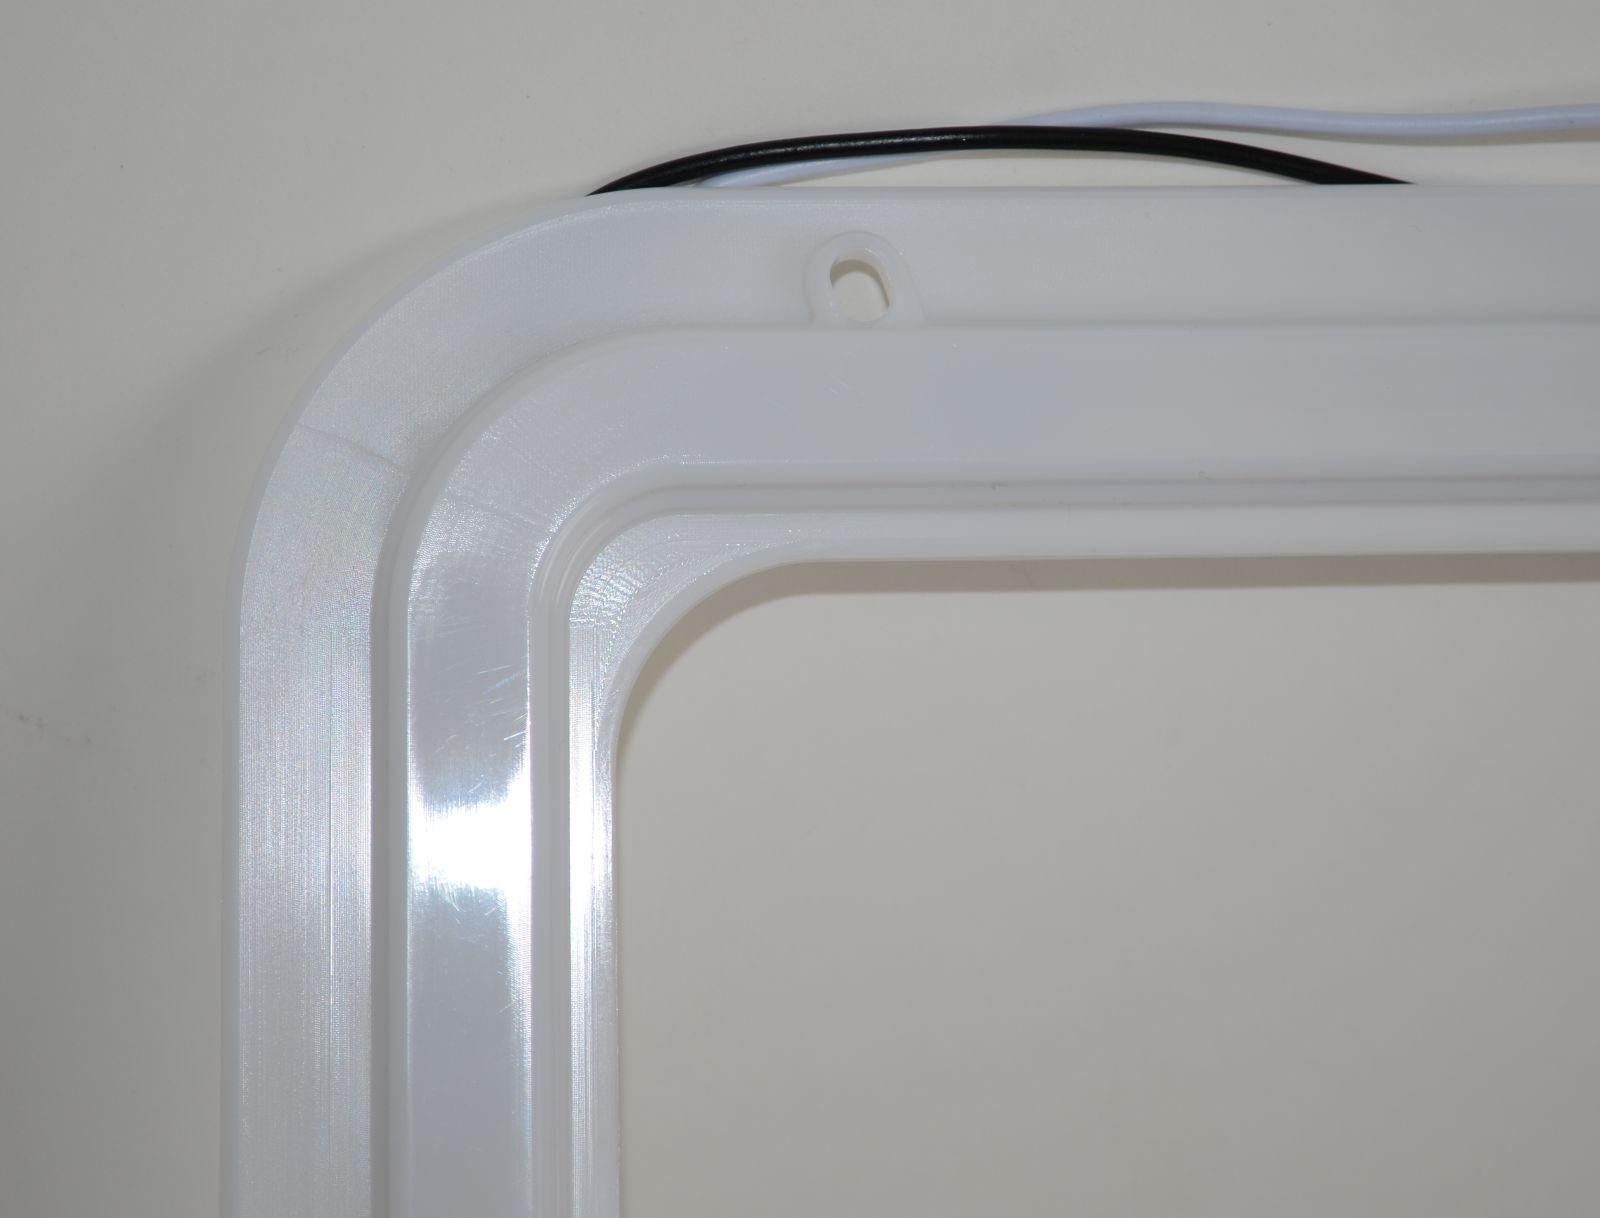 Class A Customs Rv Chandelier Led Light Garnish Ring 12